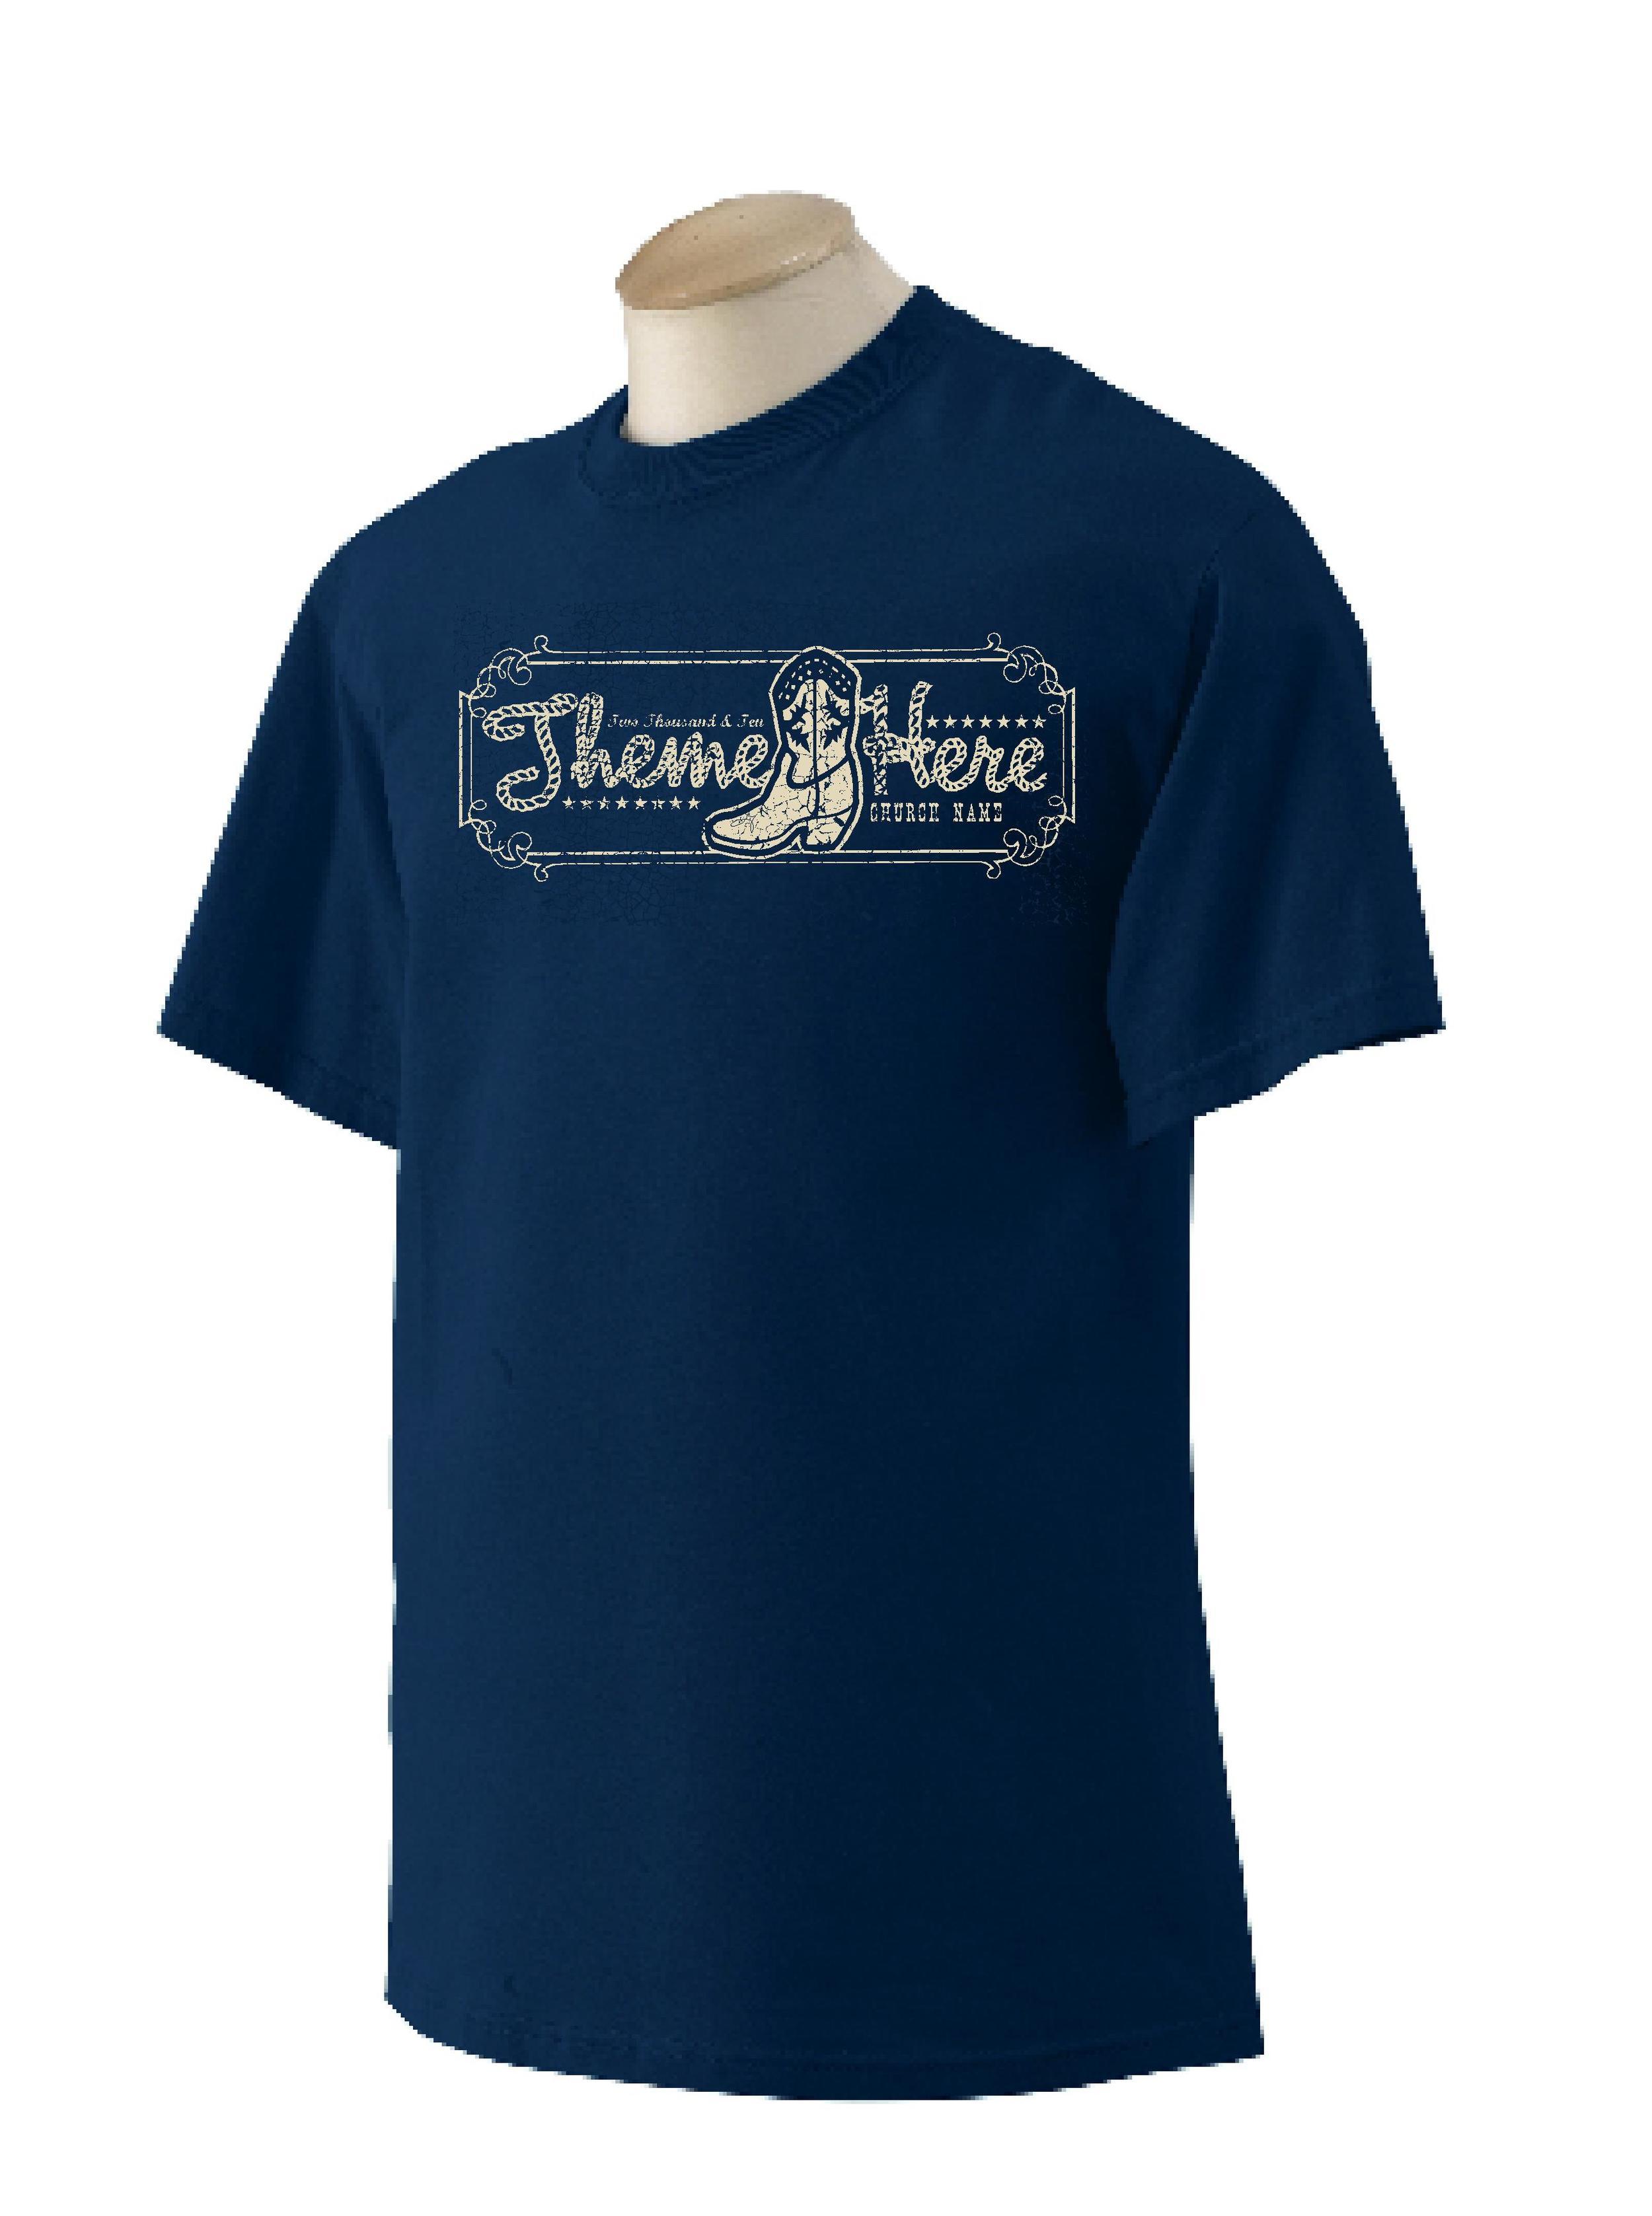 Ranch 2 navy shirt.jpg